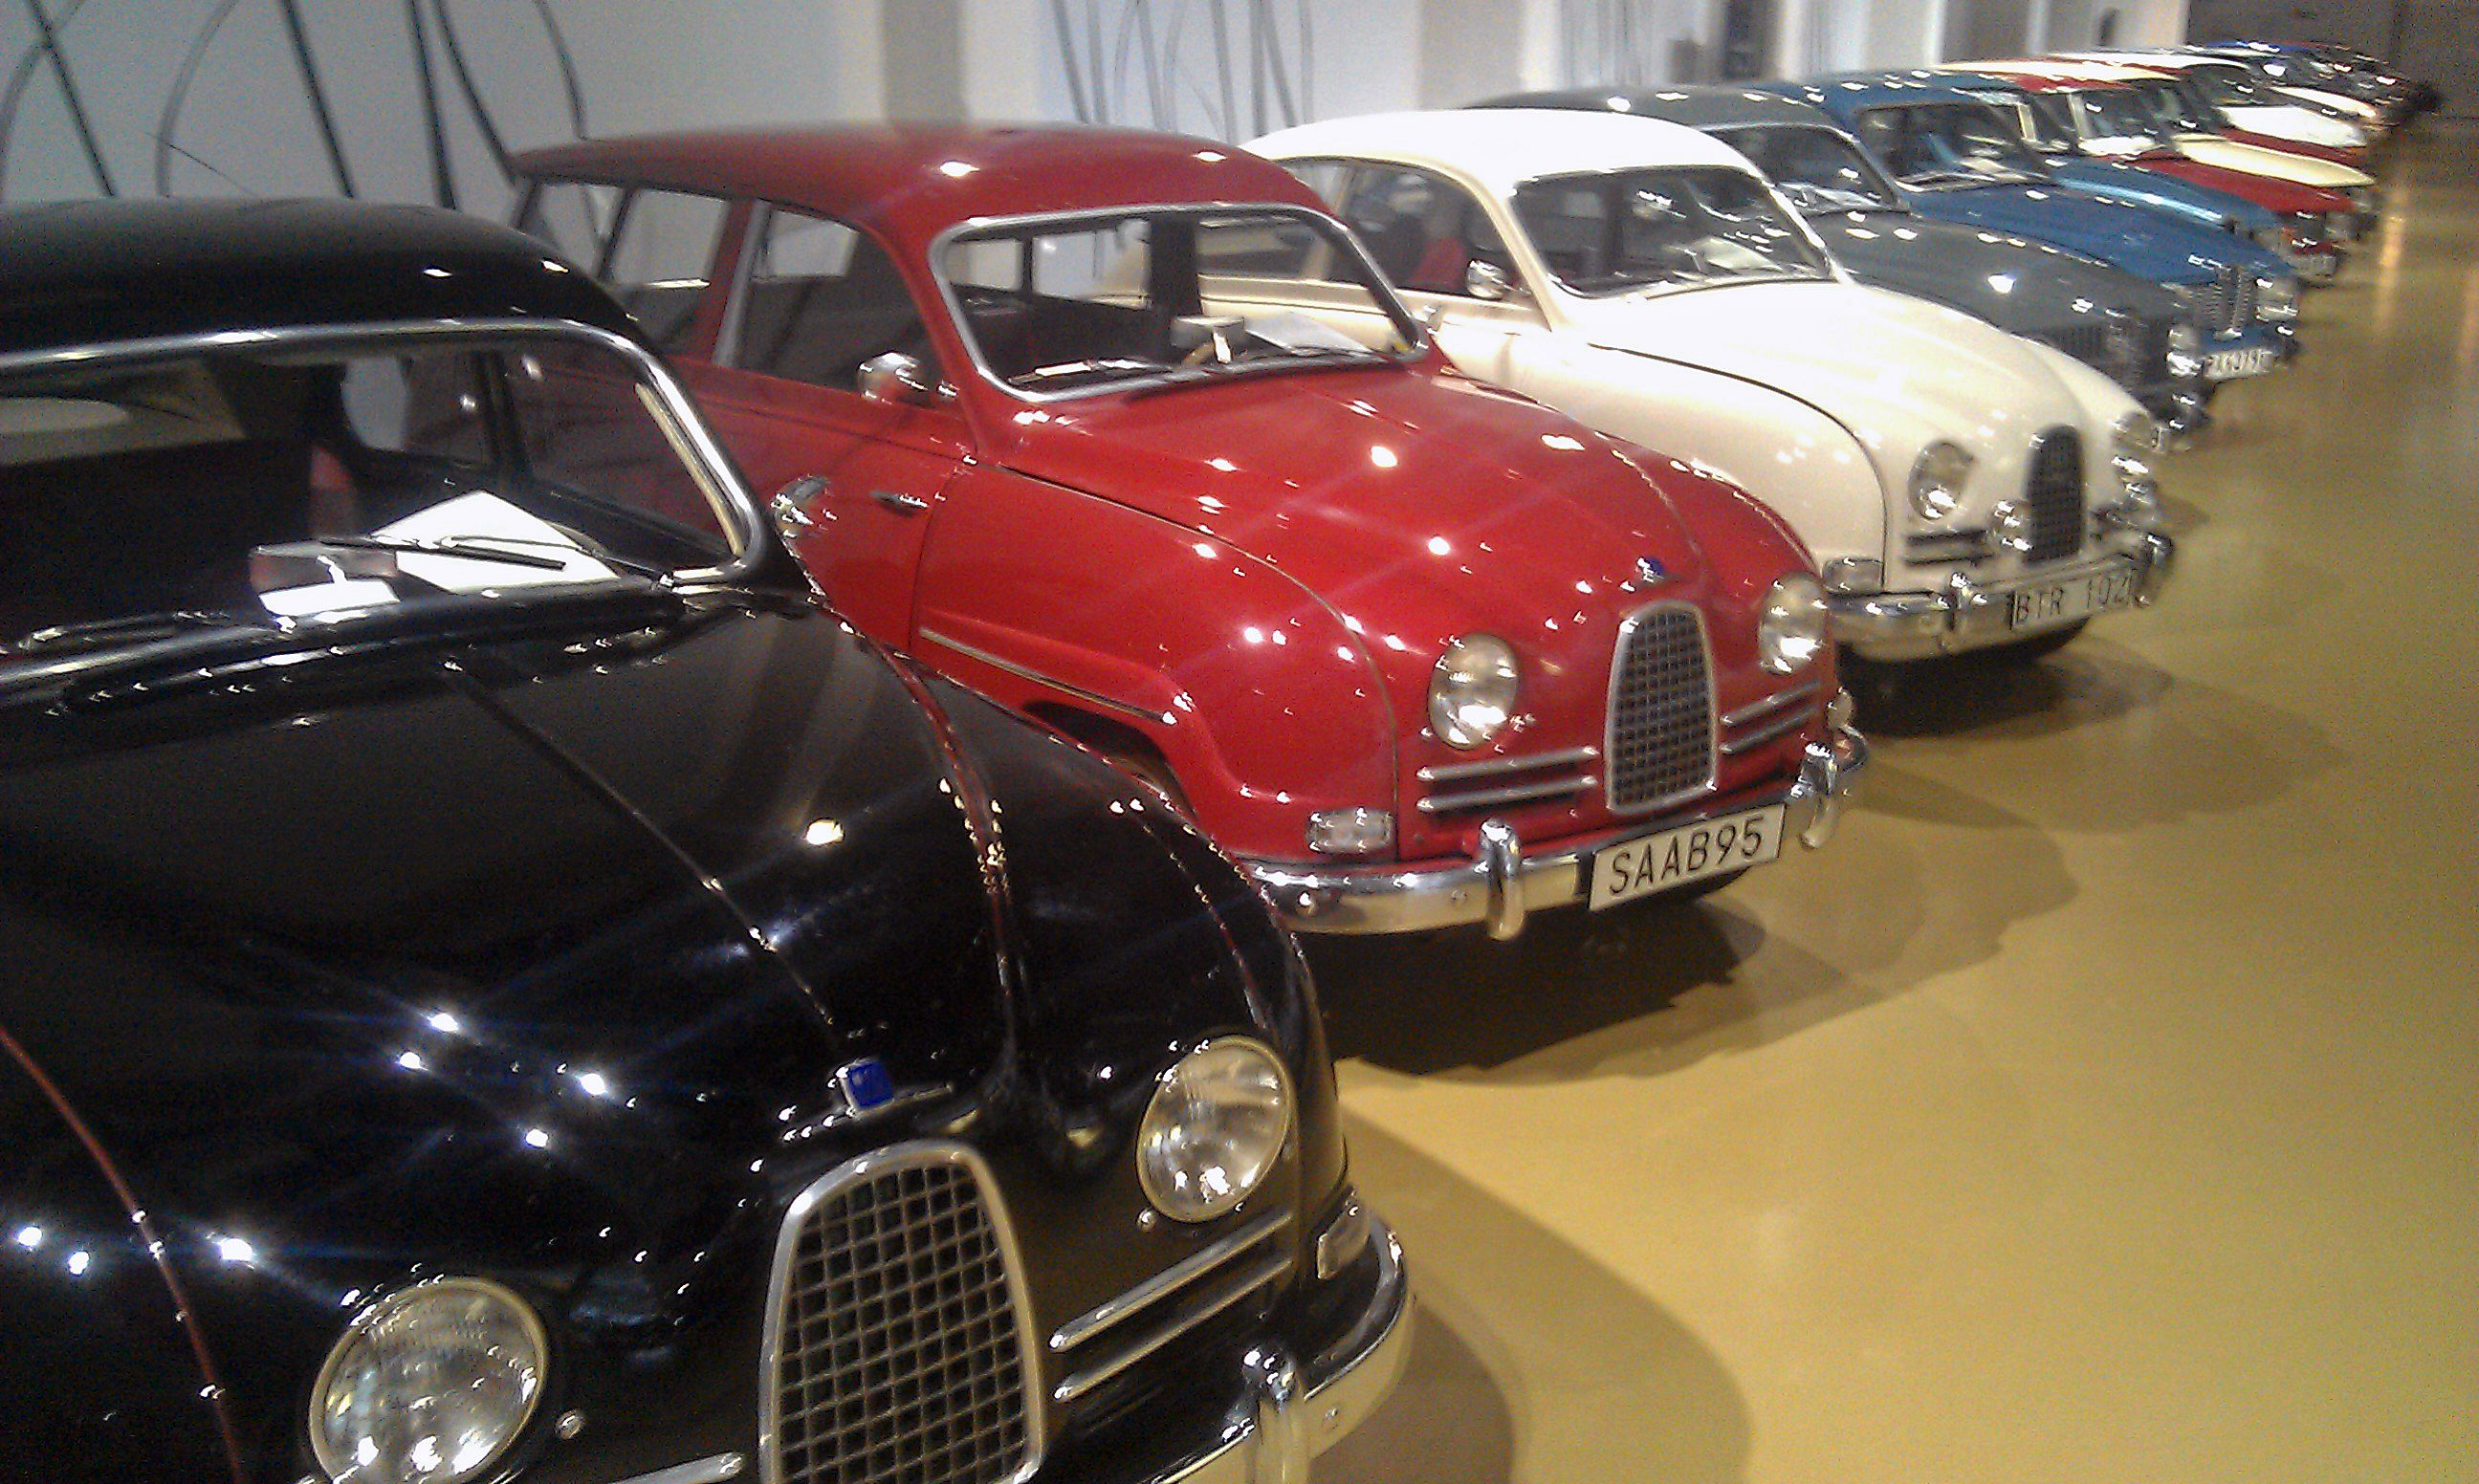 Another Glimpse Inside The Saabmuseum In Trollhättan